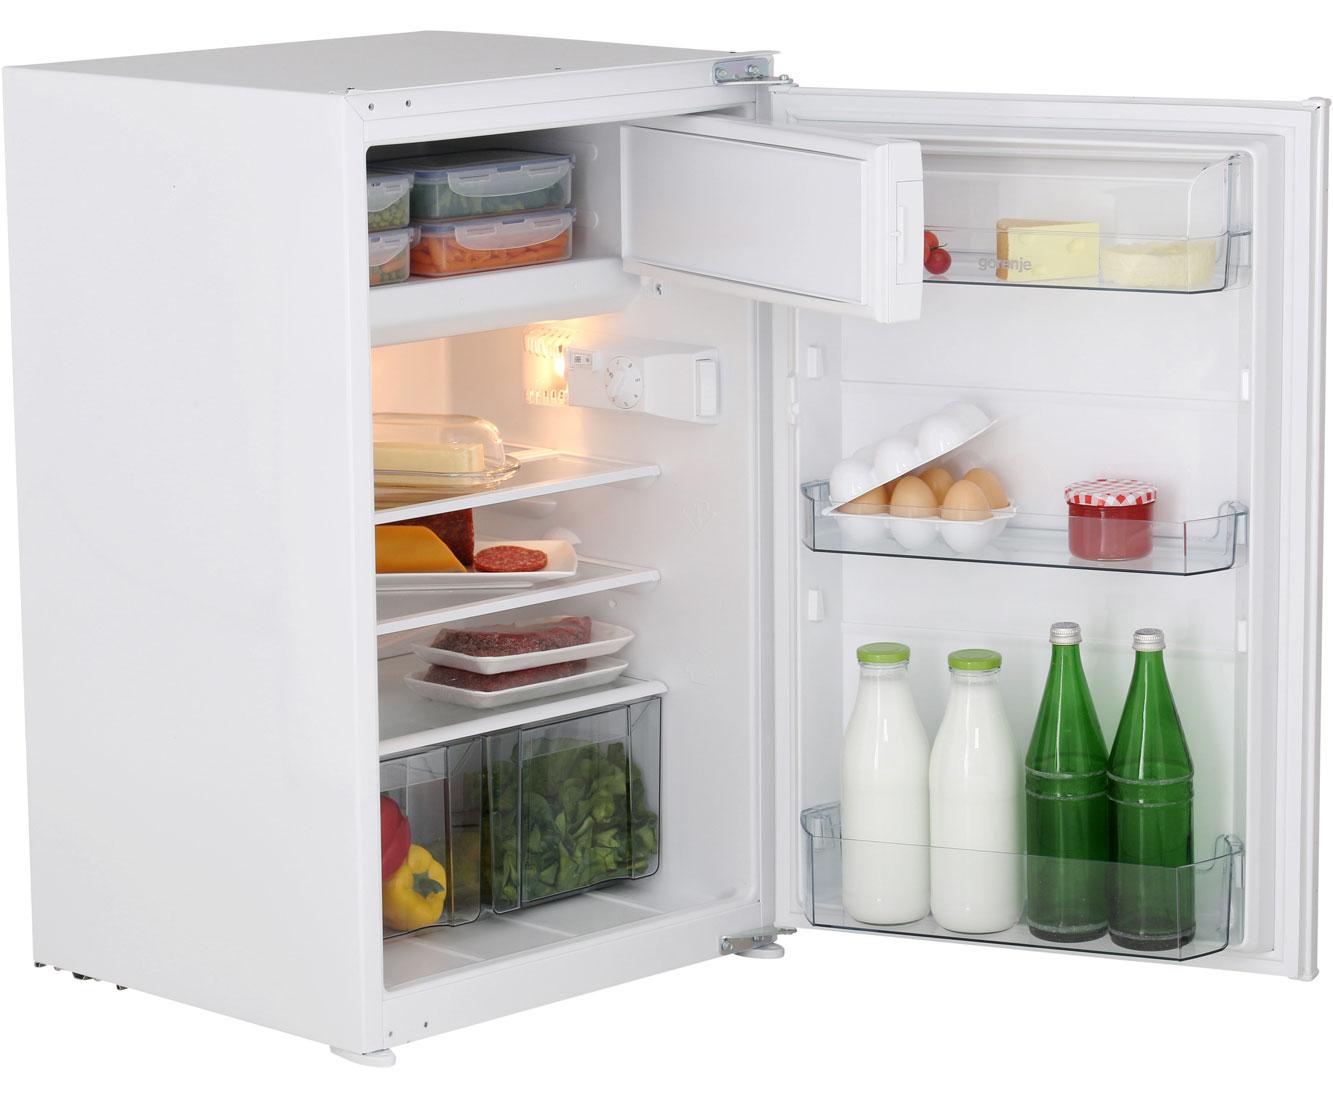 Gorenje Kühlschrank Zweitürig : Kühlschrank gorenje gorenje retro kühlschrank orange neuwertig np